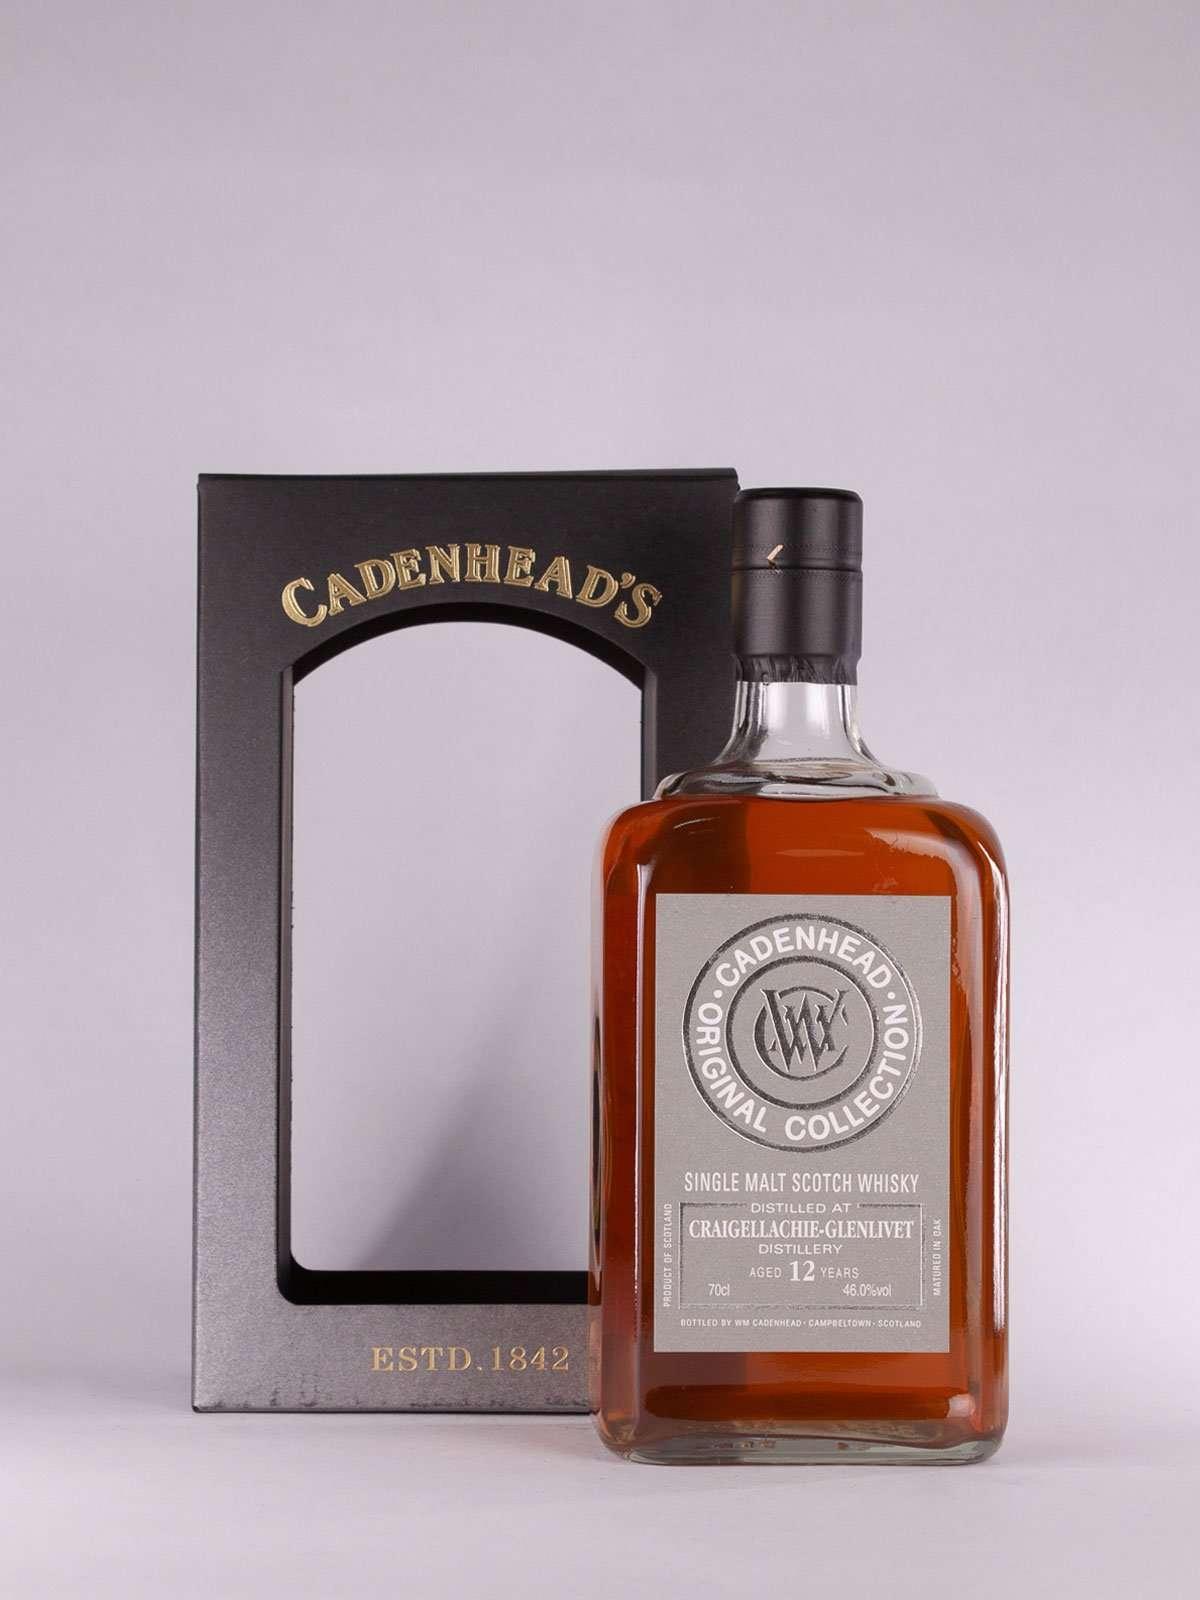 Cadenhead Craigellachie 12yo